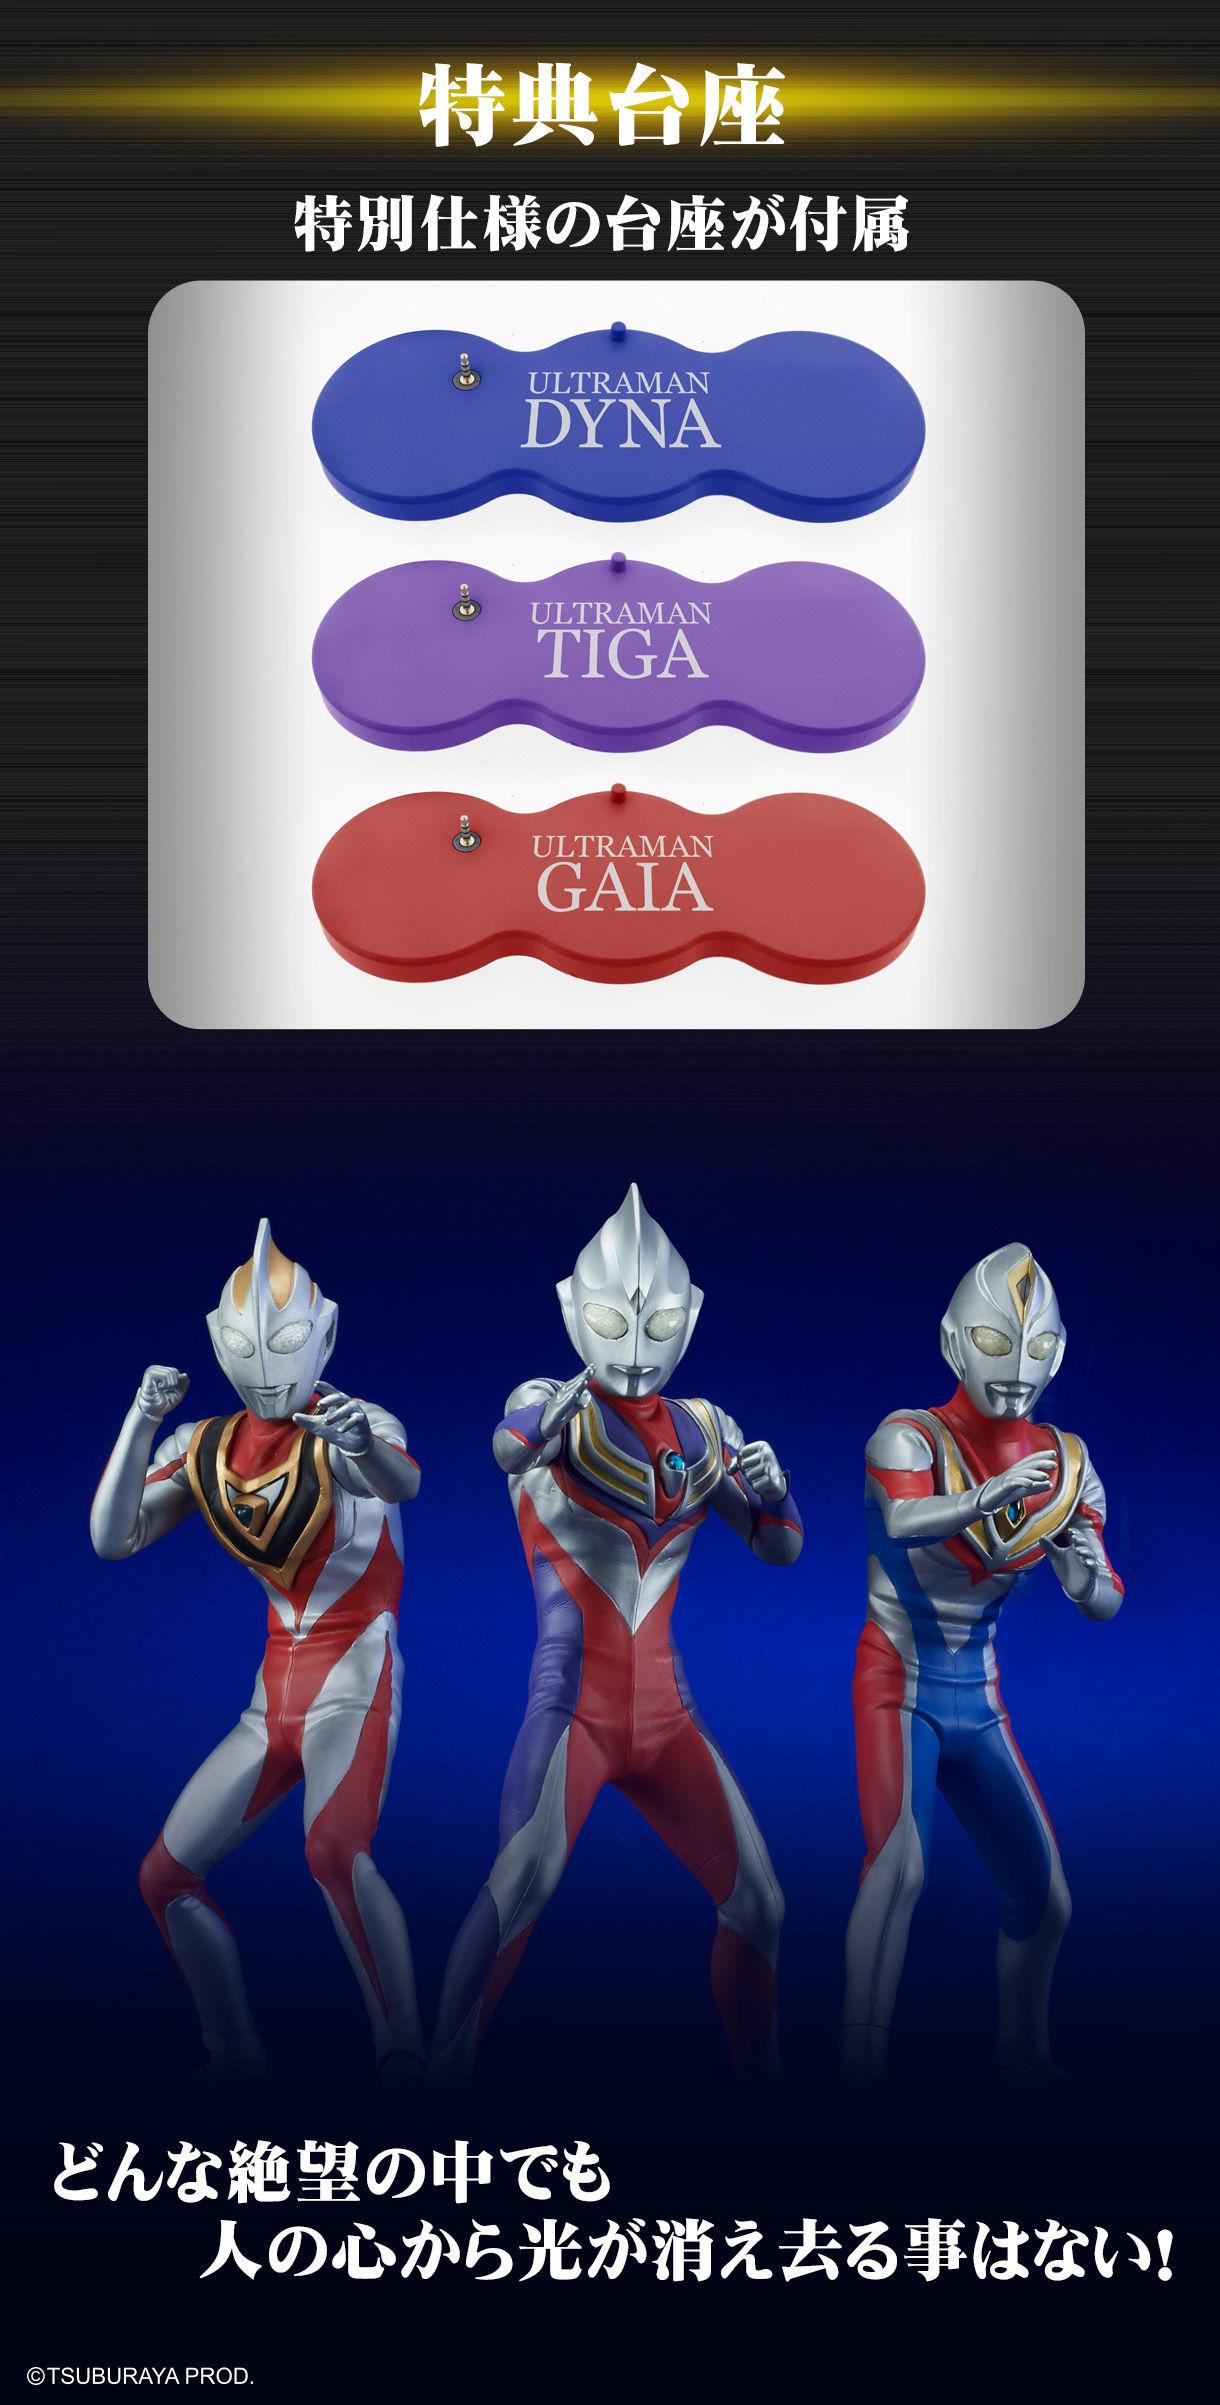 Ultraman - Ultra New Generation TDG (Tiga/Dyna/Gaia) Set (Tsuburaya Prod) CyPxCehL_o